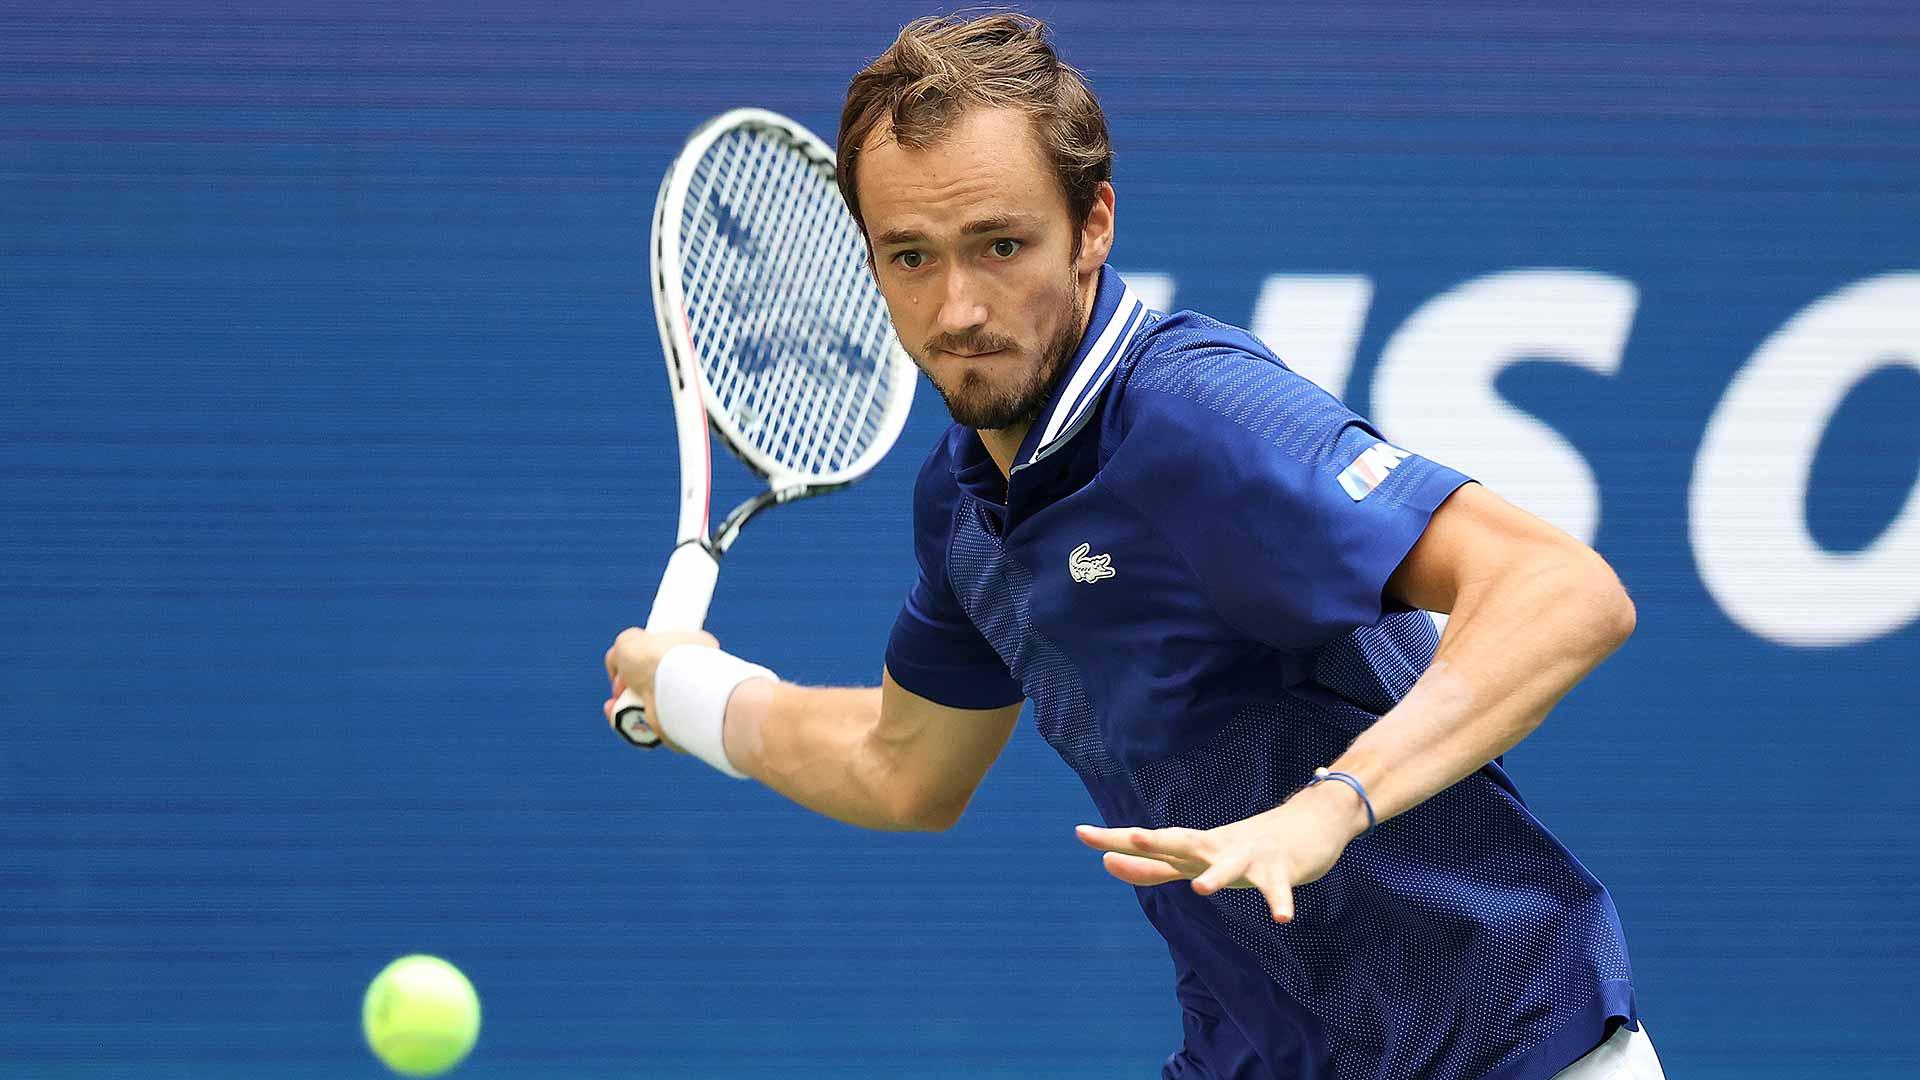 Daniil Medvedev derrota a Djokovic, Abierto EU